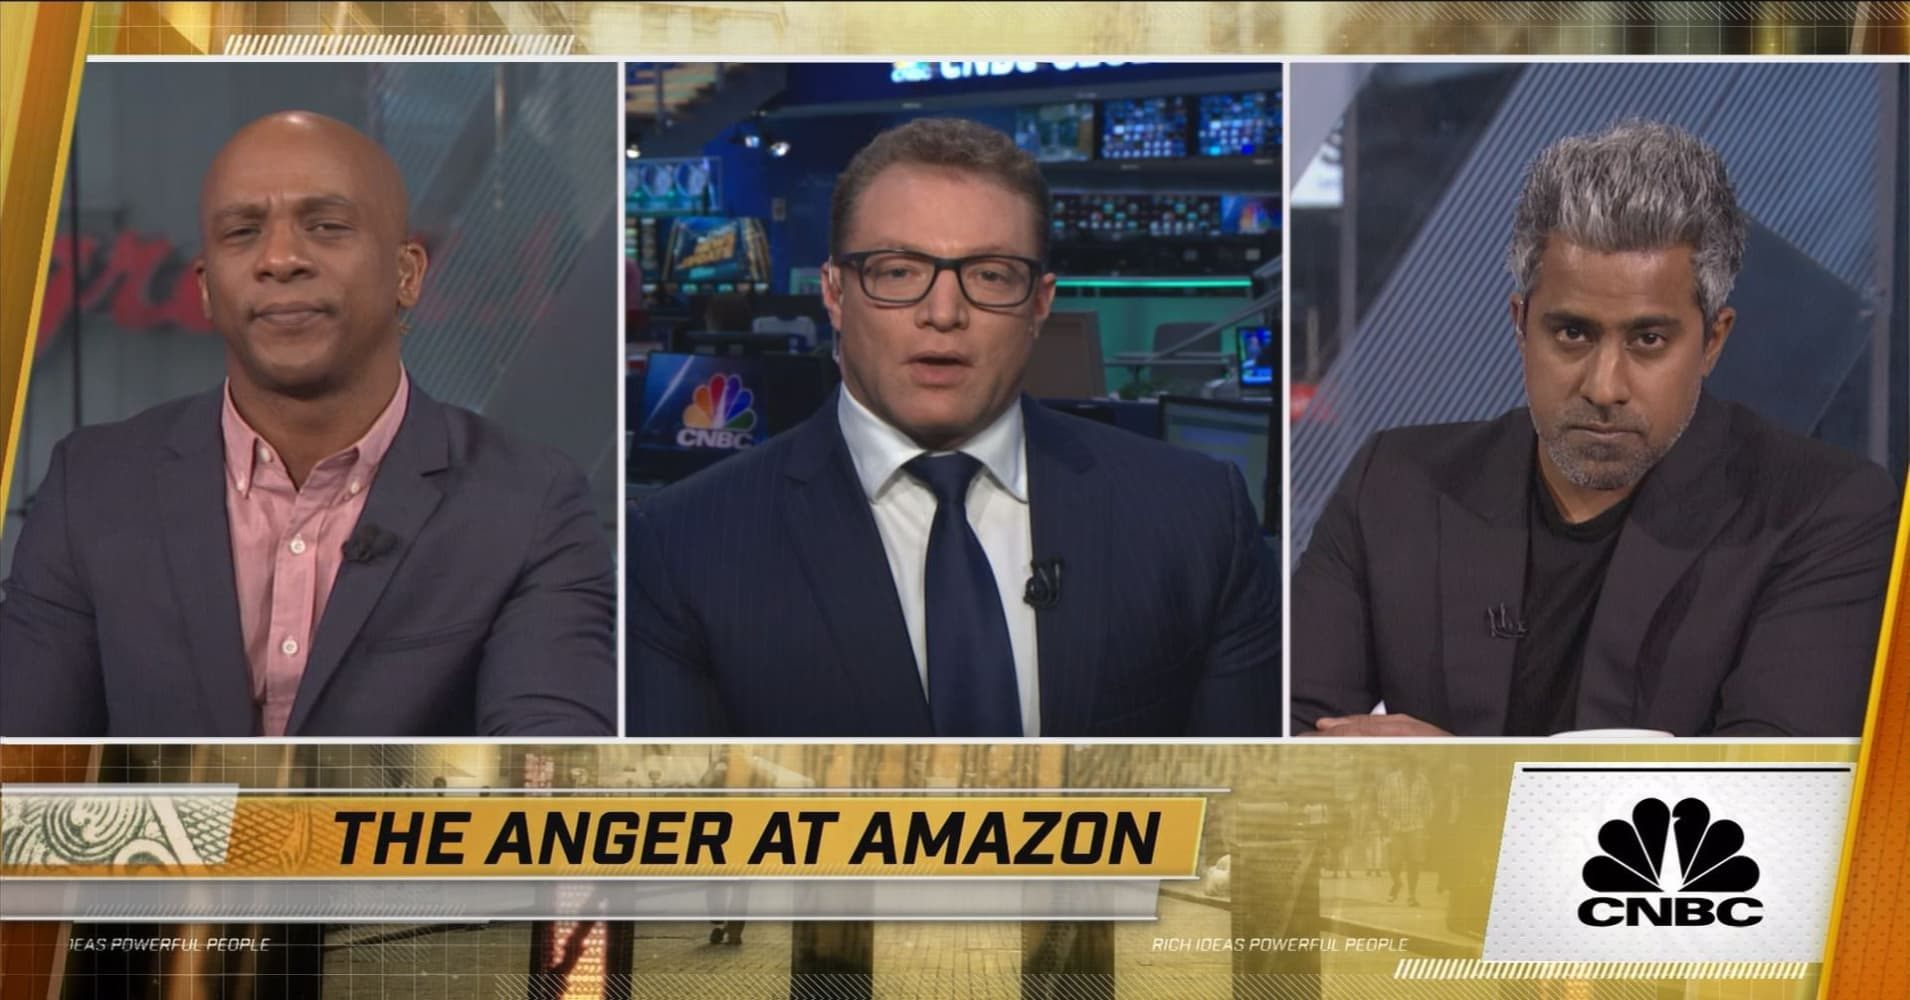 Amazon leaves NYC: Good or Bad? With Anand Giridharadas and Robert Frank